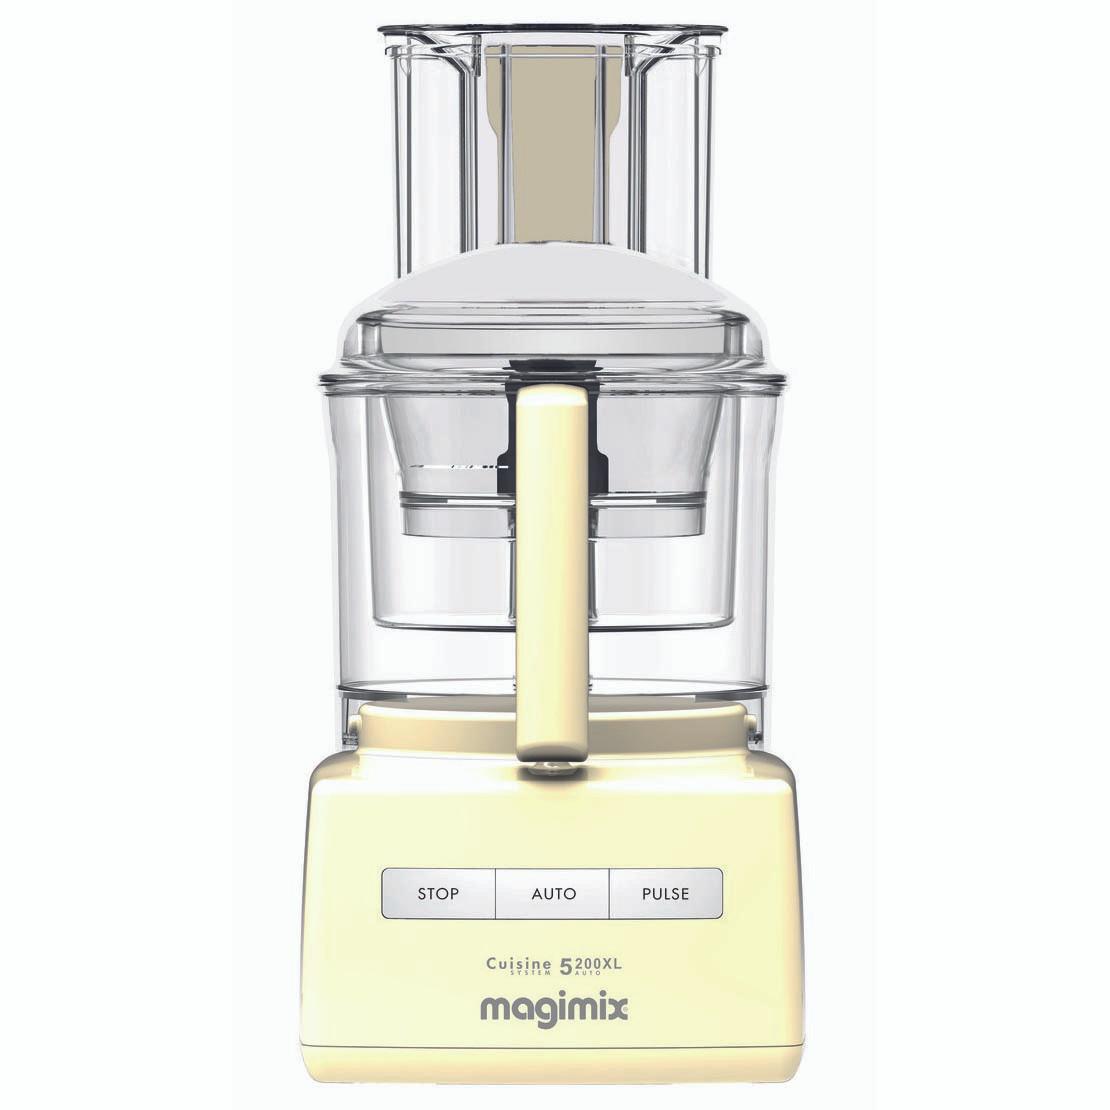 Magimix 5200 XL Cuisine Systeme in Cream